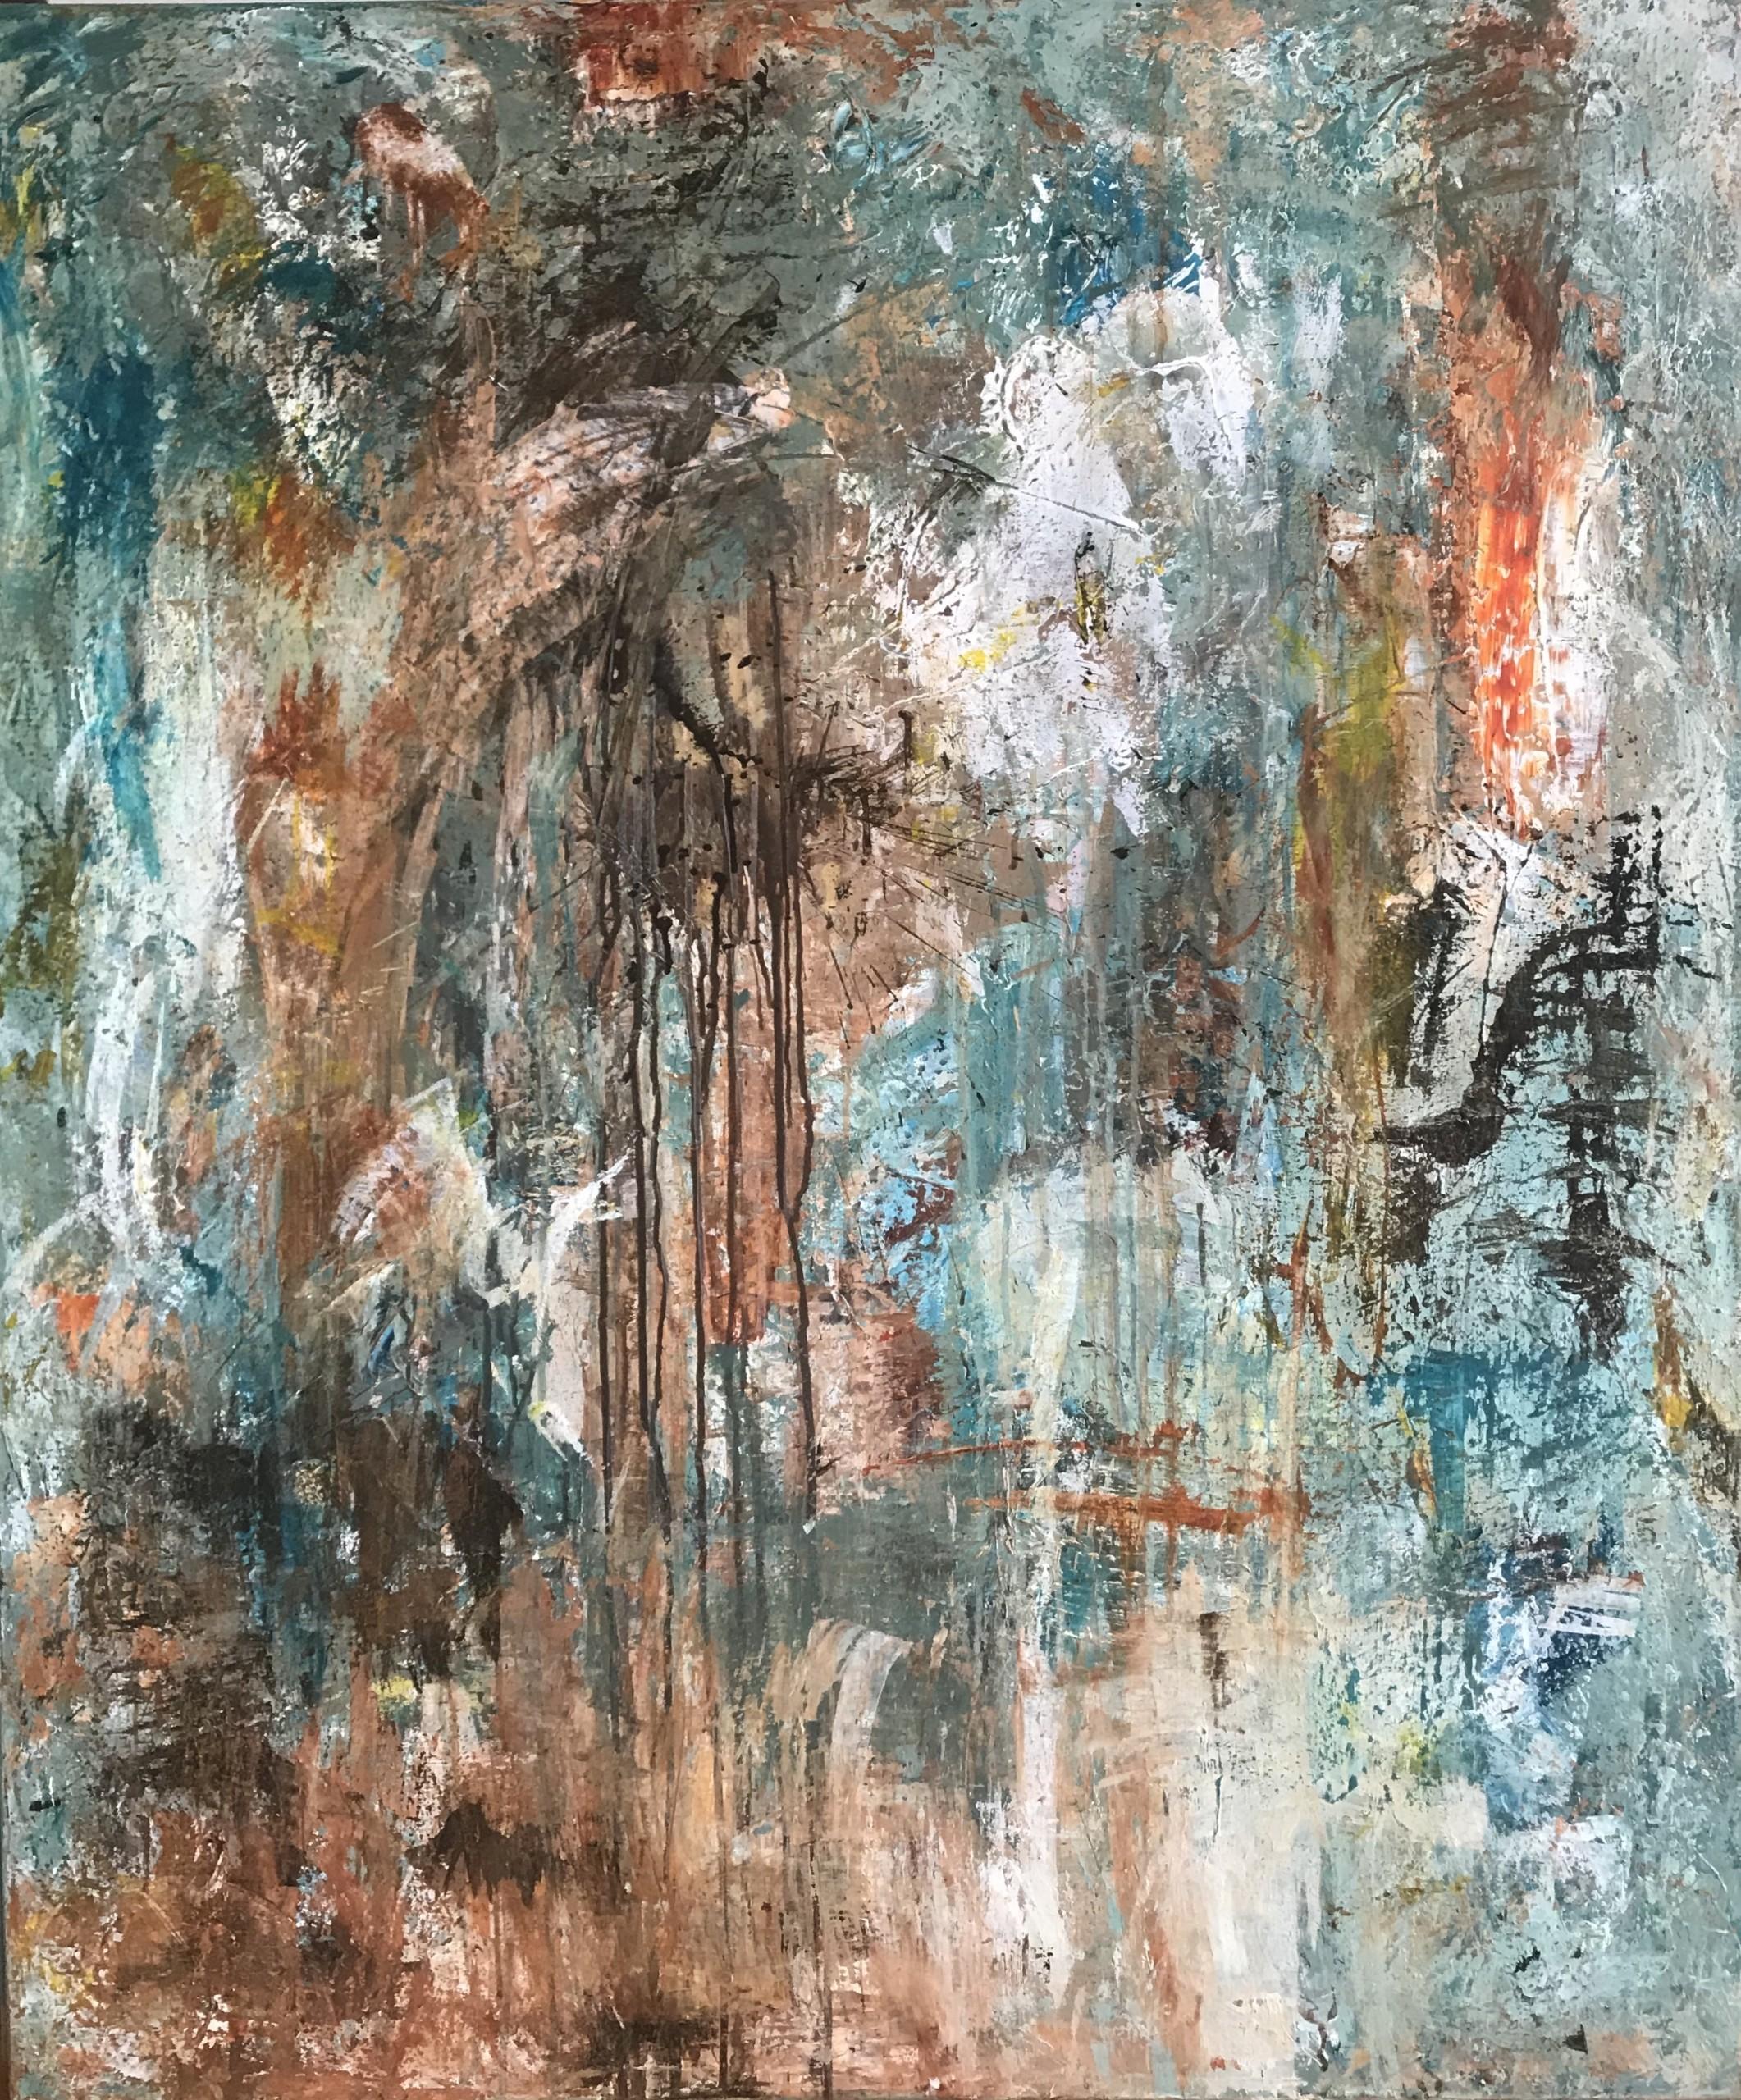 """Into the wild"" - Christina Clemen"